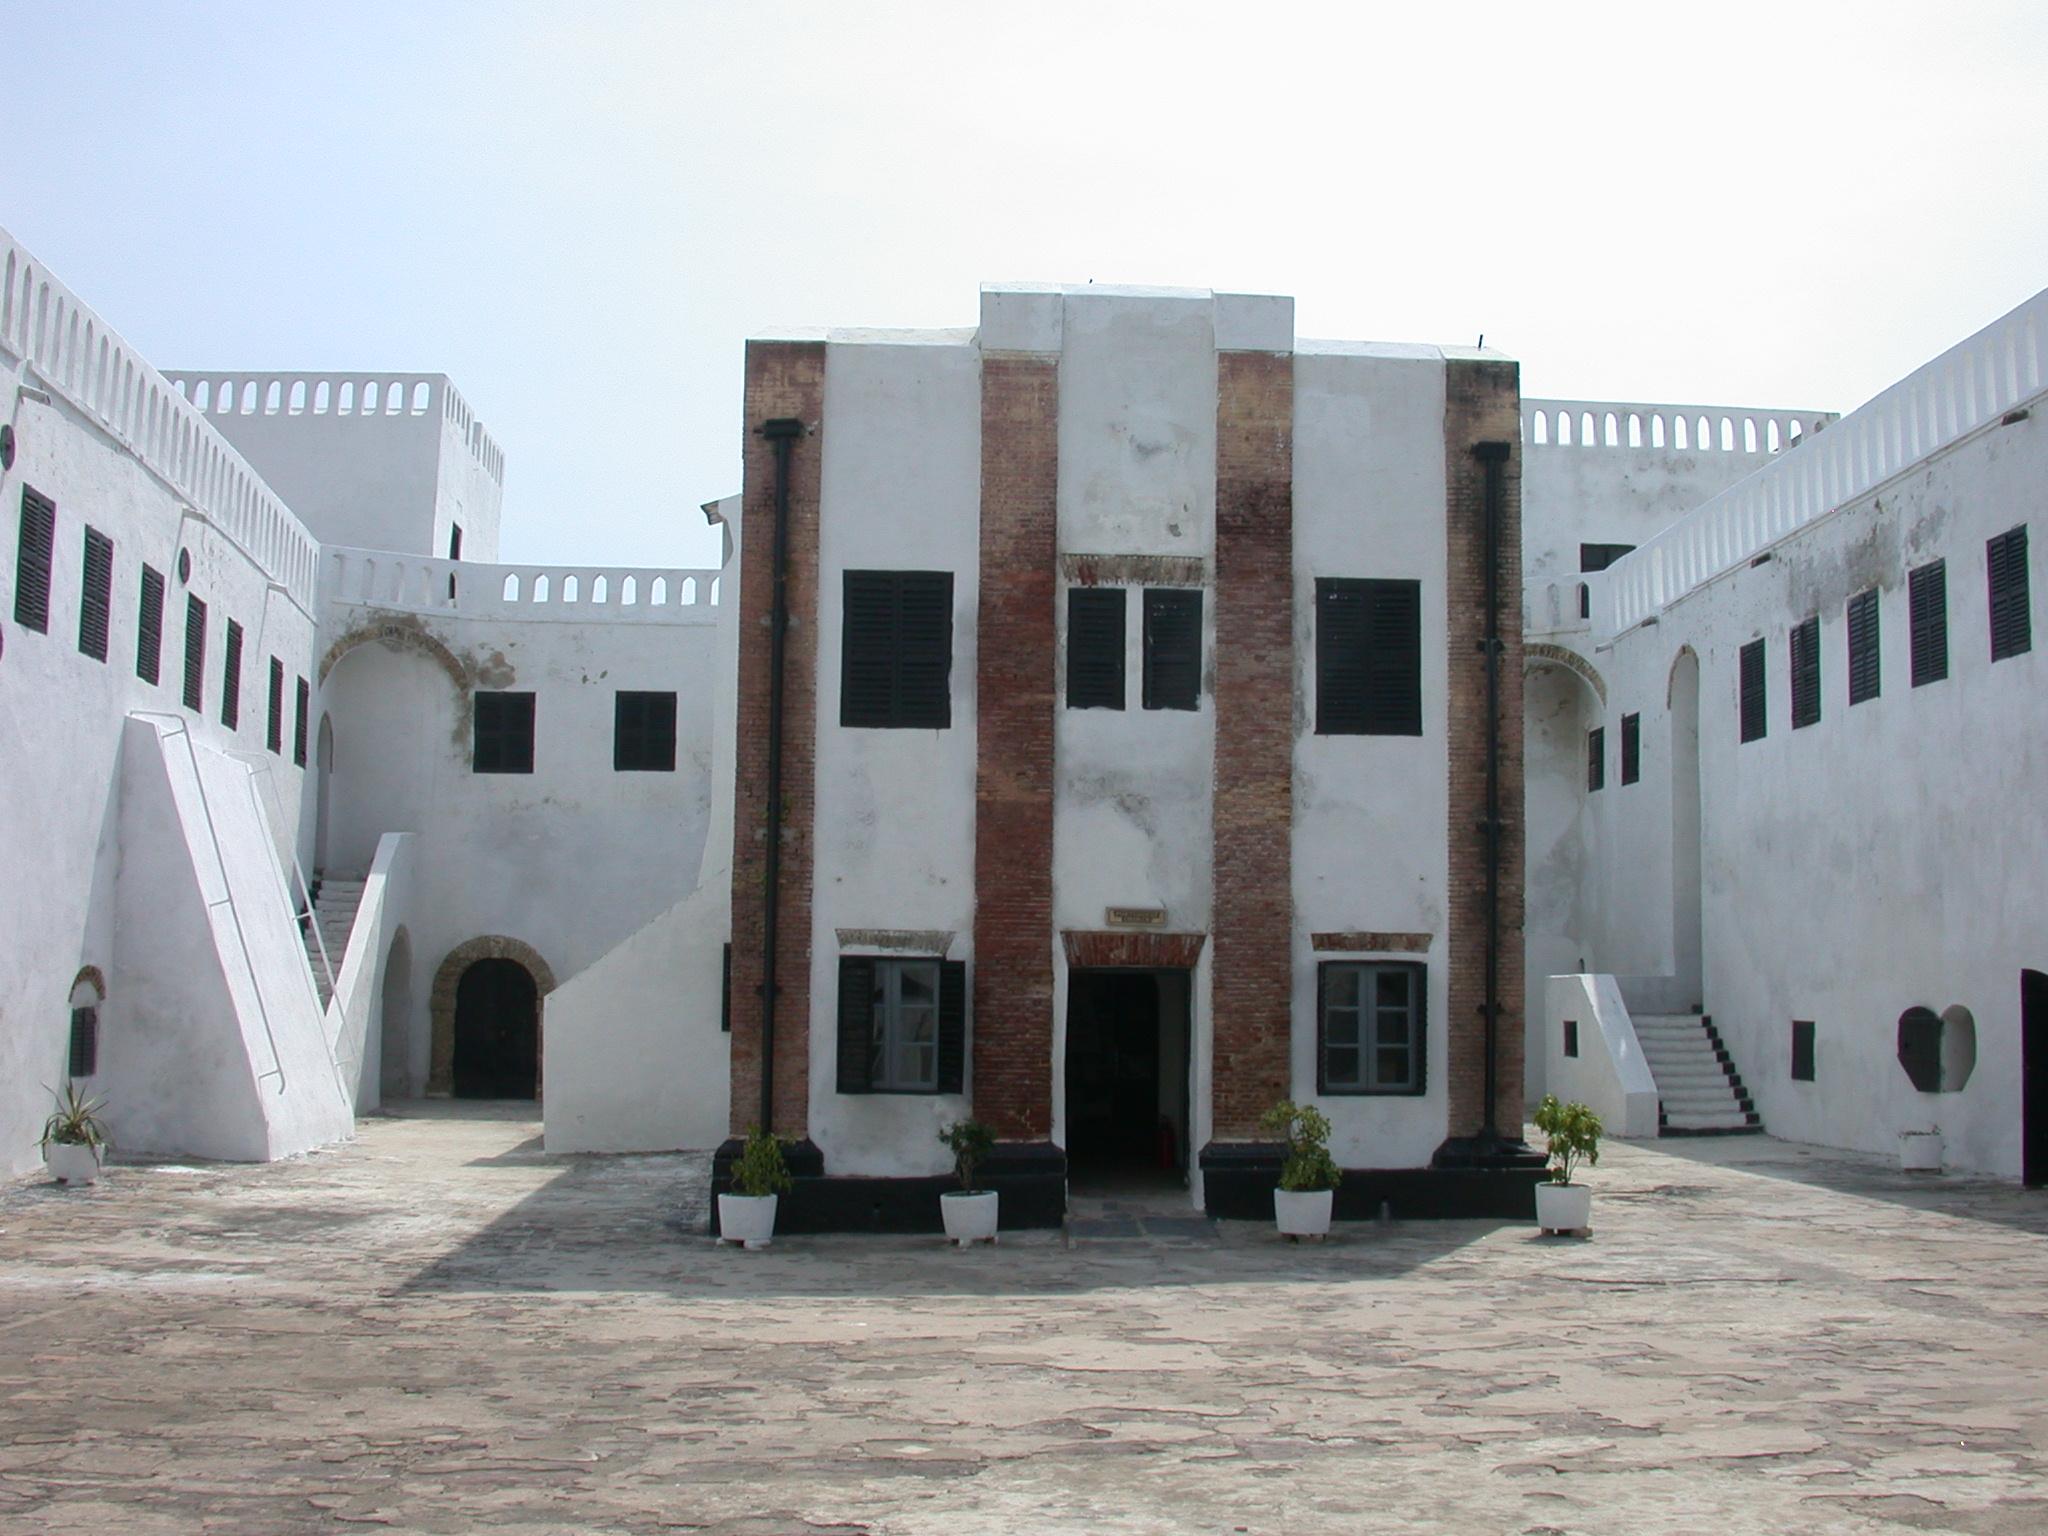 Portuguese Chapel in Courtyard, Elmina Slave Fort, Elmina, Ghana